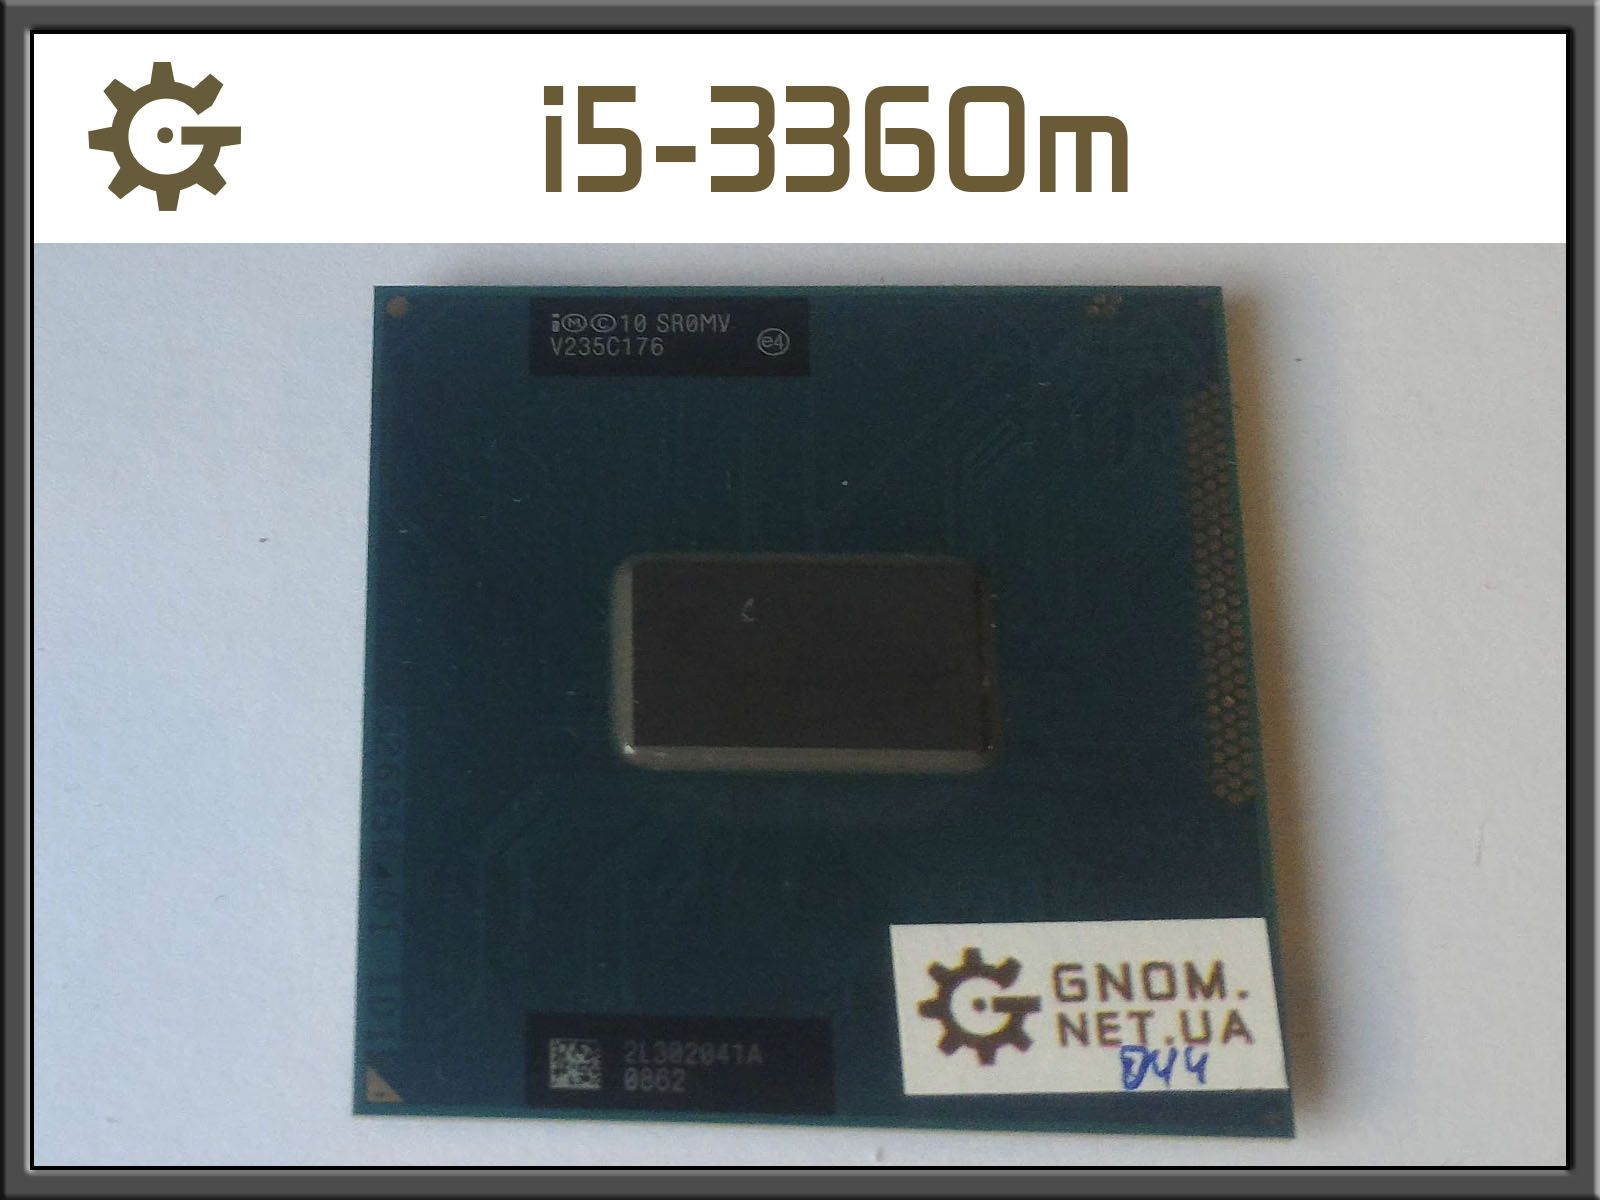 Процессор Intel Core i5-3360m ноутбук Ivy 3 поколение Socket G2 +т/п